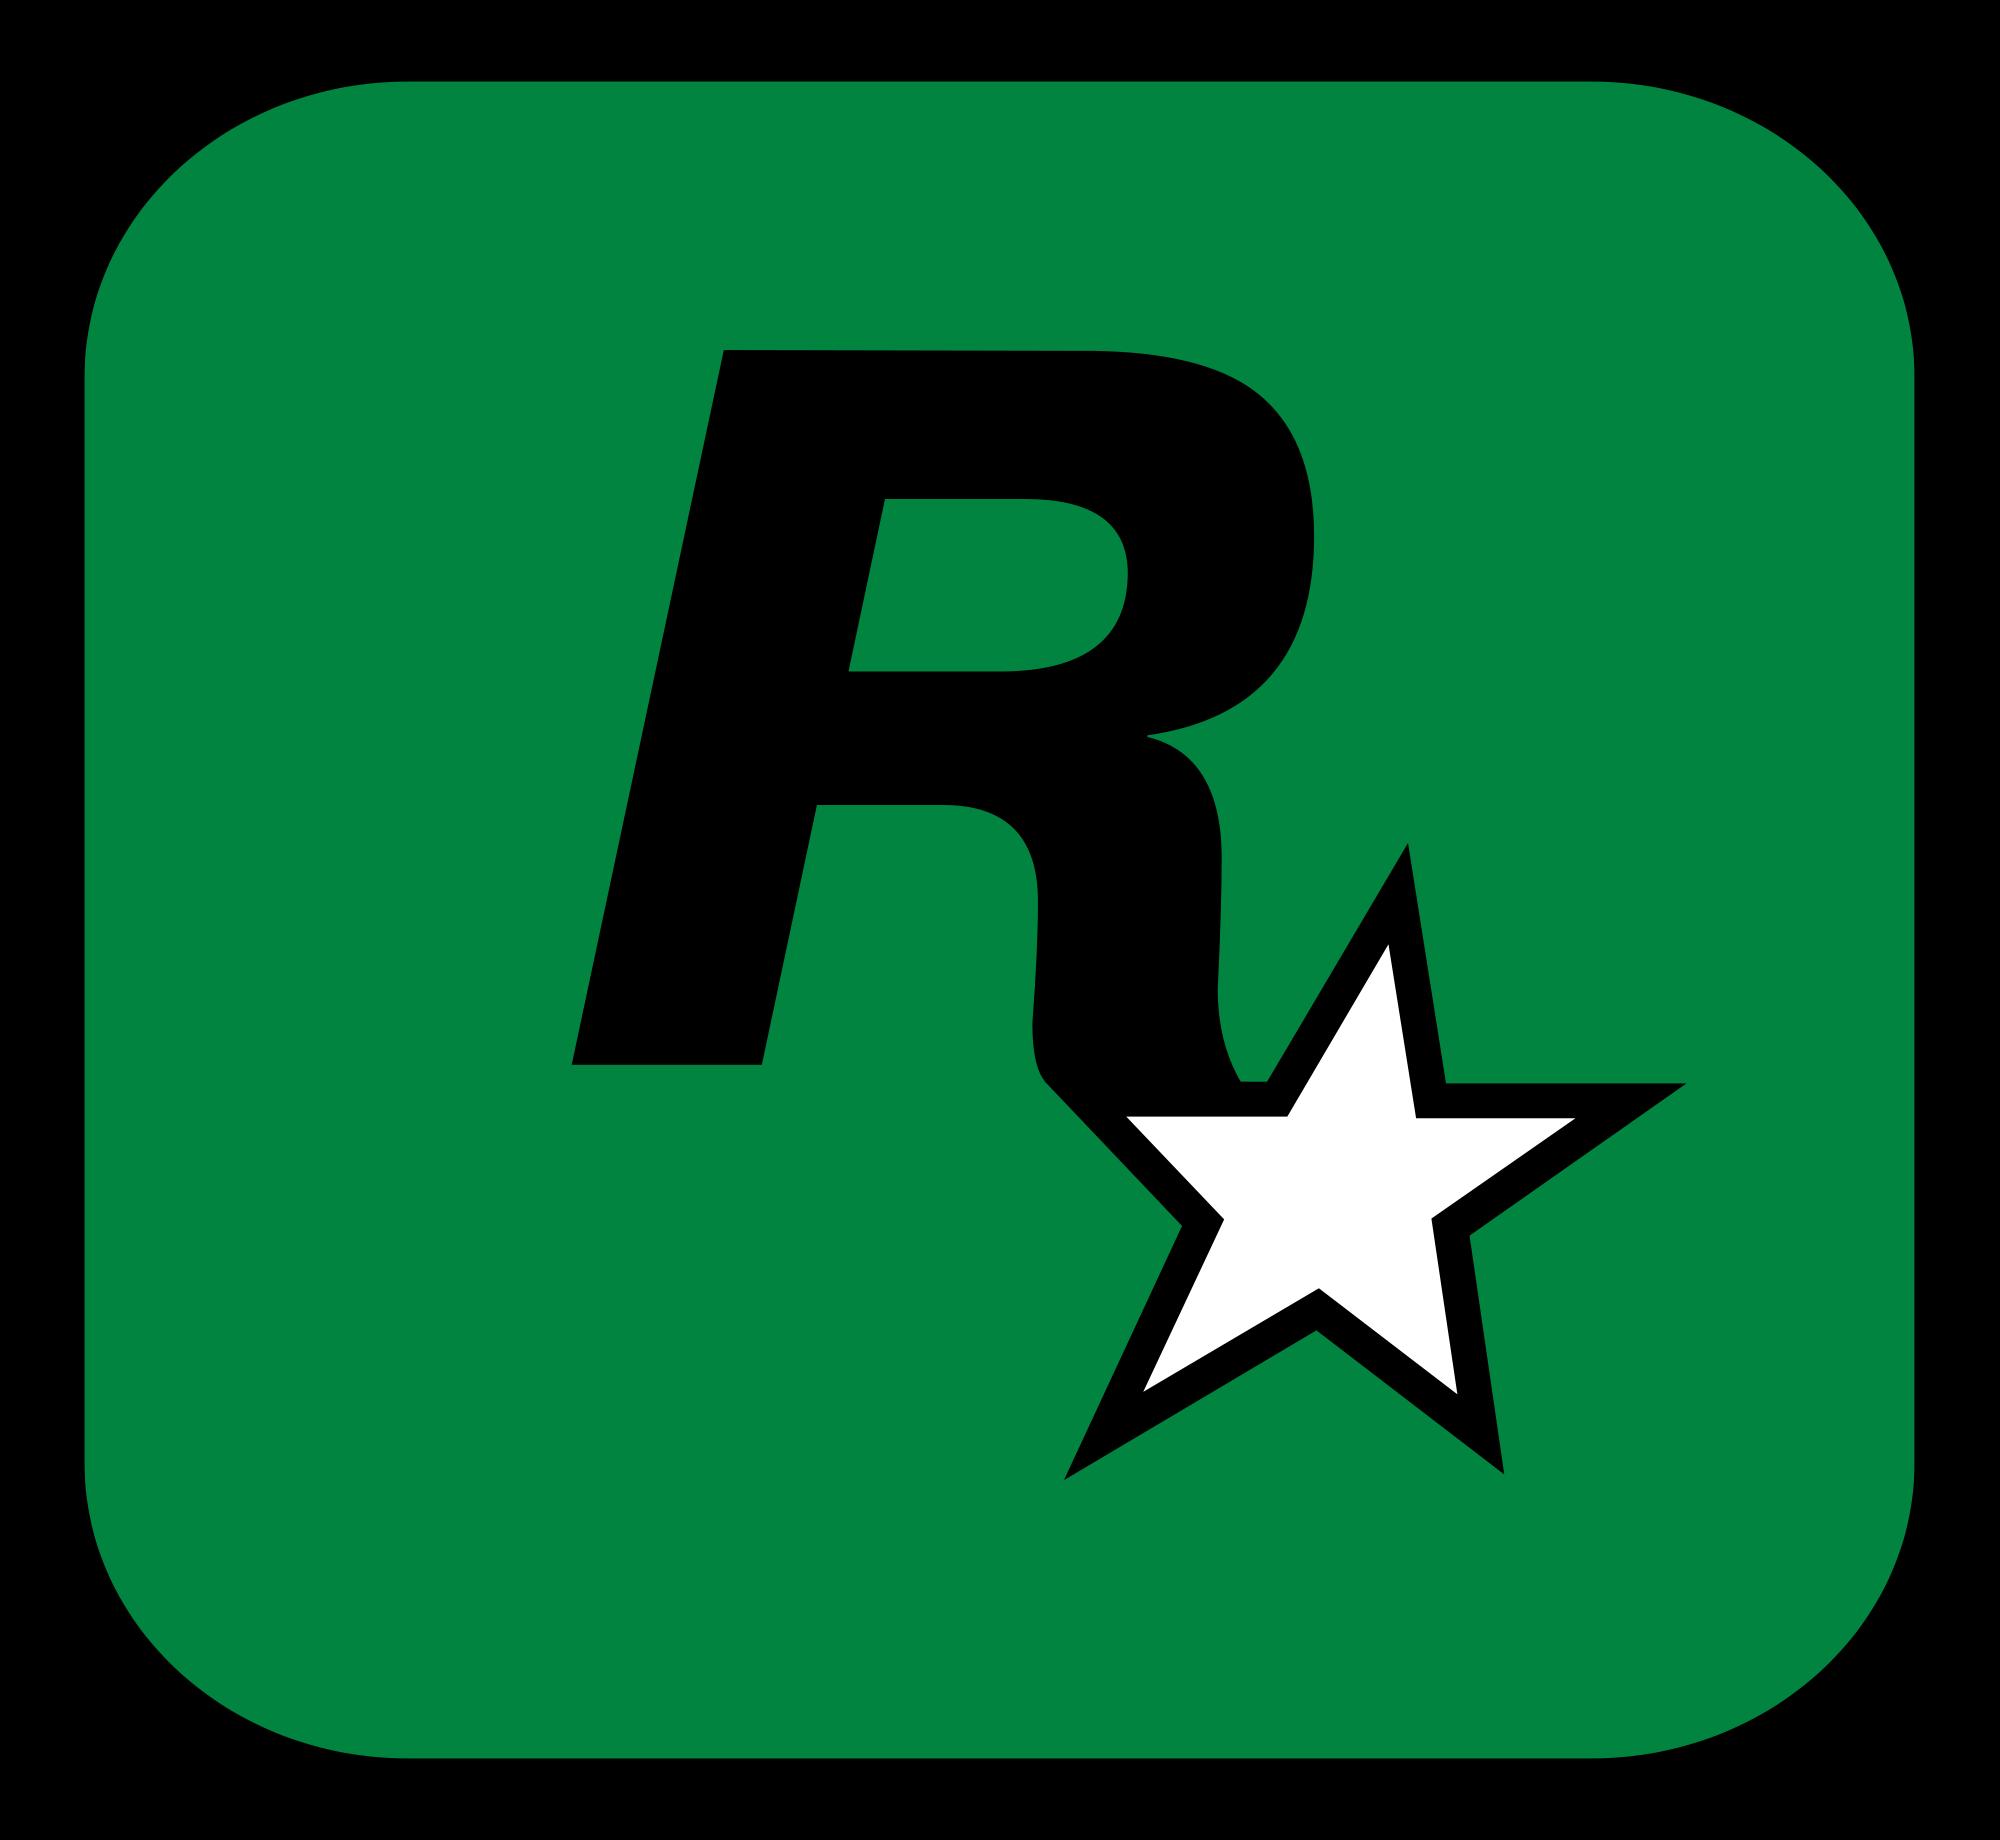 rockstar games logo - green | Boy | Rockstar games logo